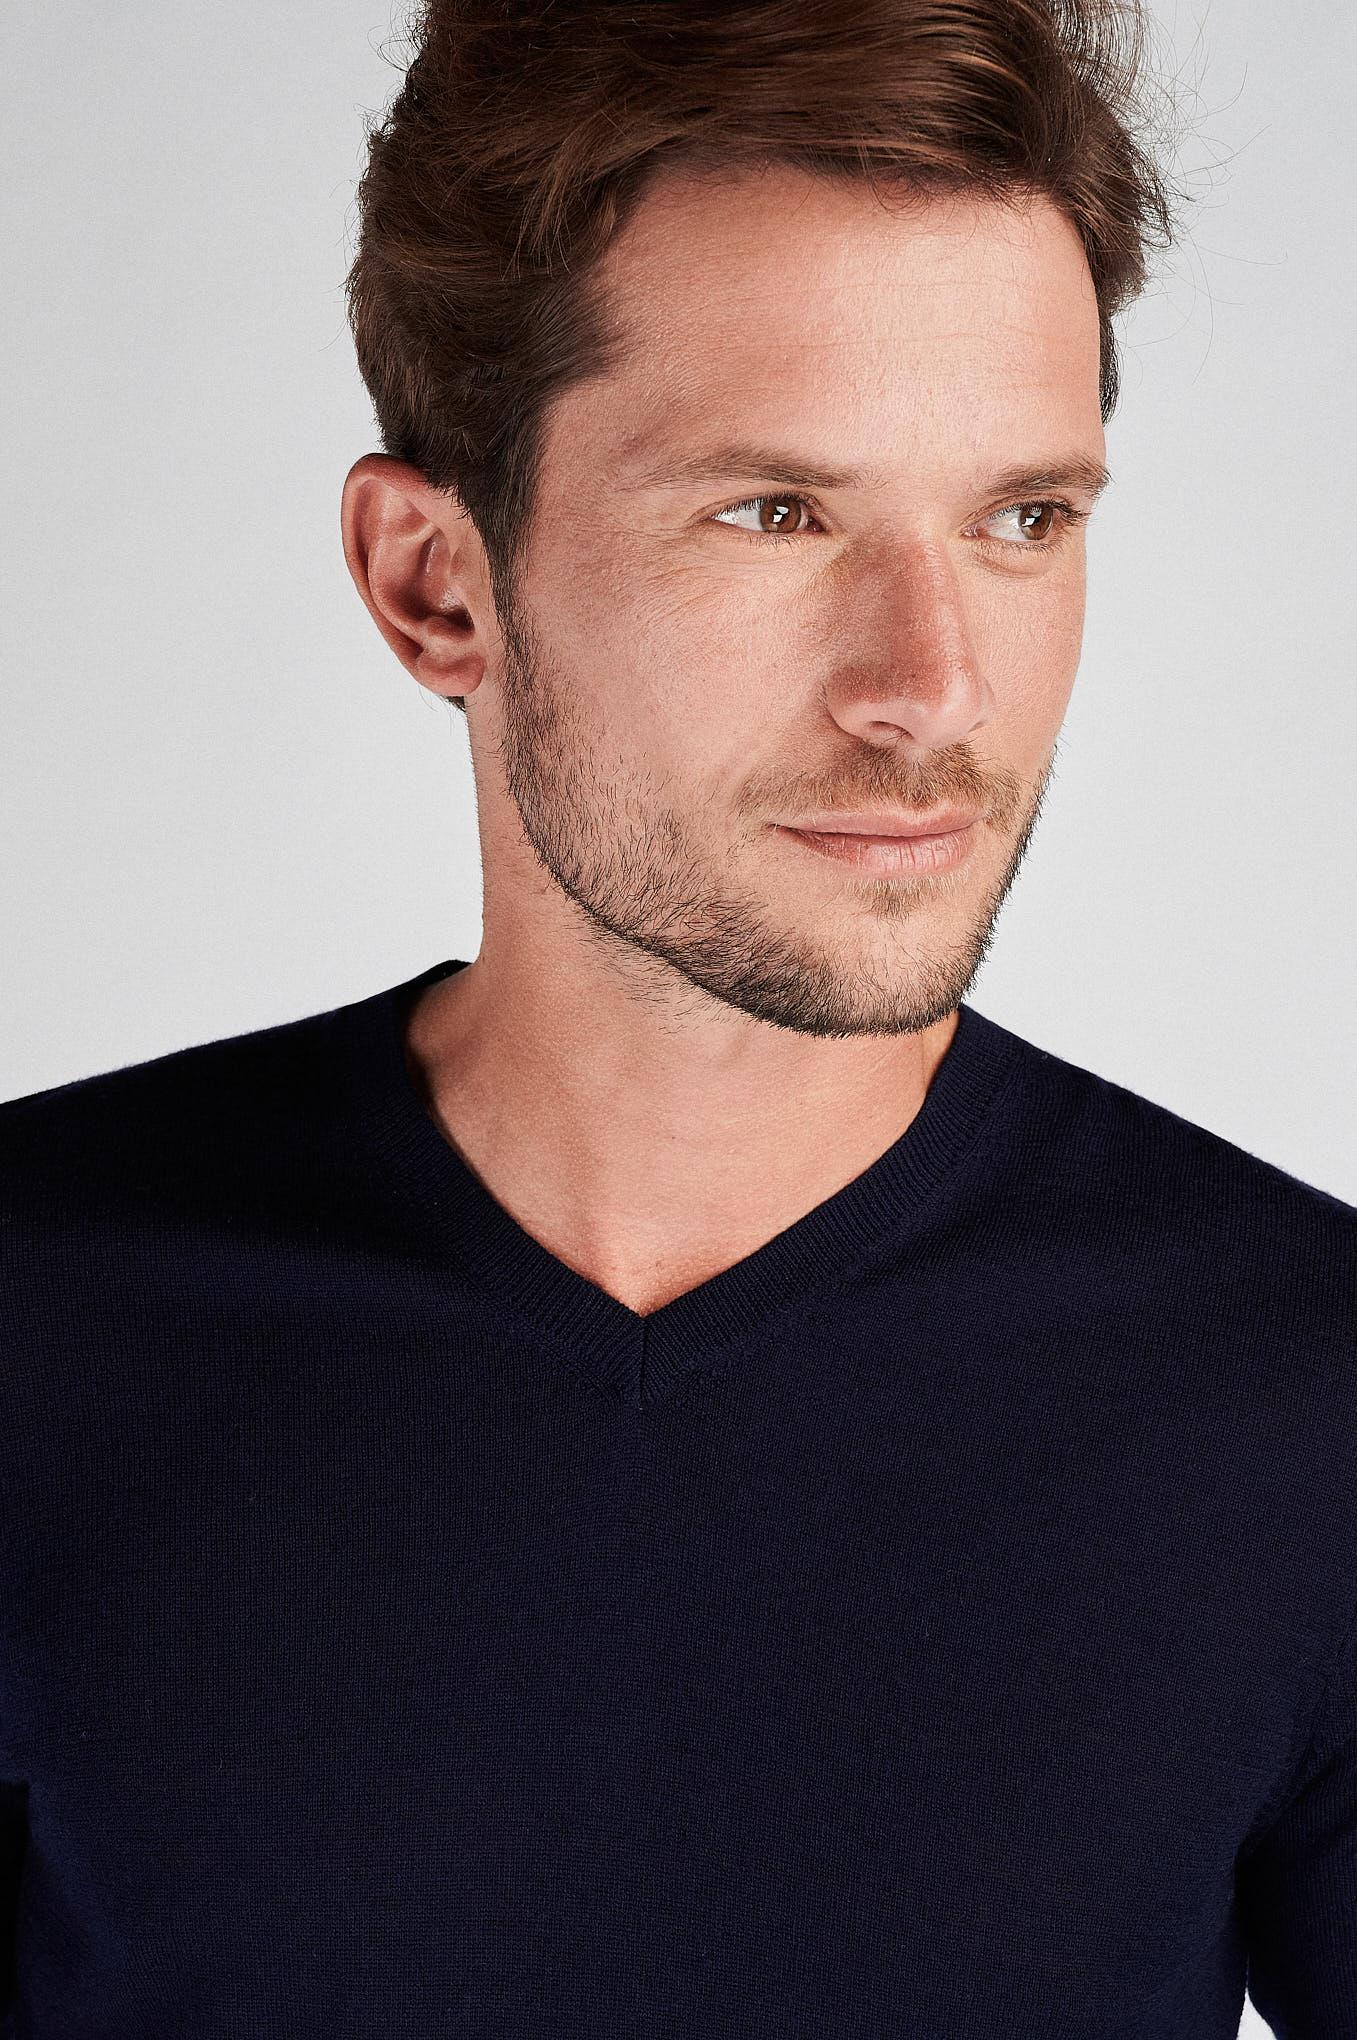 Sweater Dark Blue Casual Man